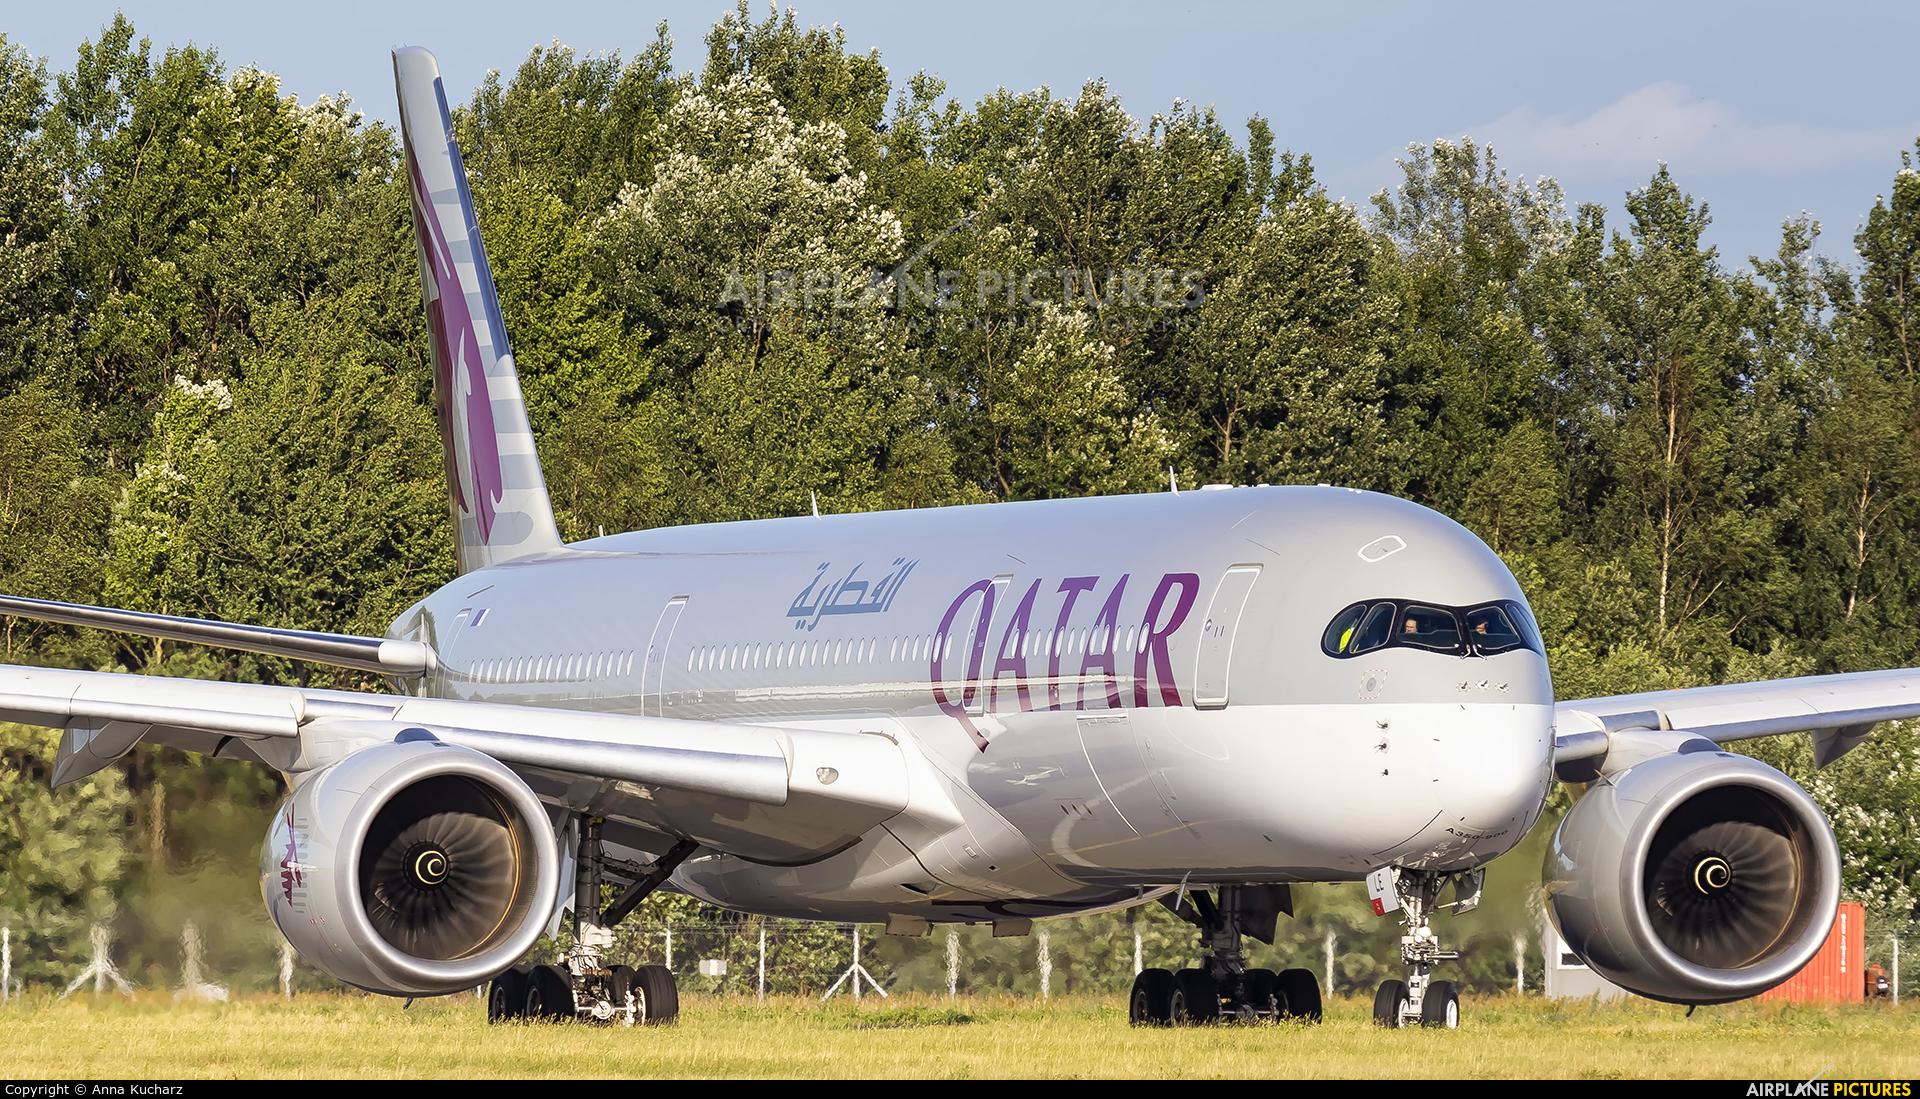 Qatar Airways A7-ALE aircraft at Warsaw - Frederic Chopin